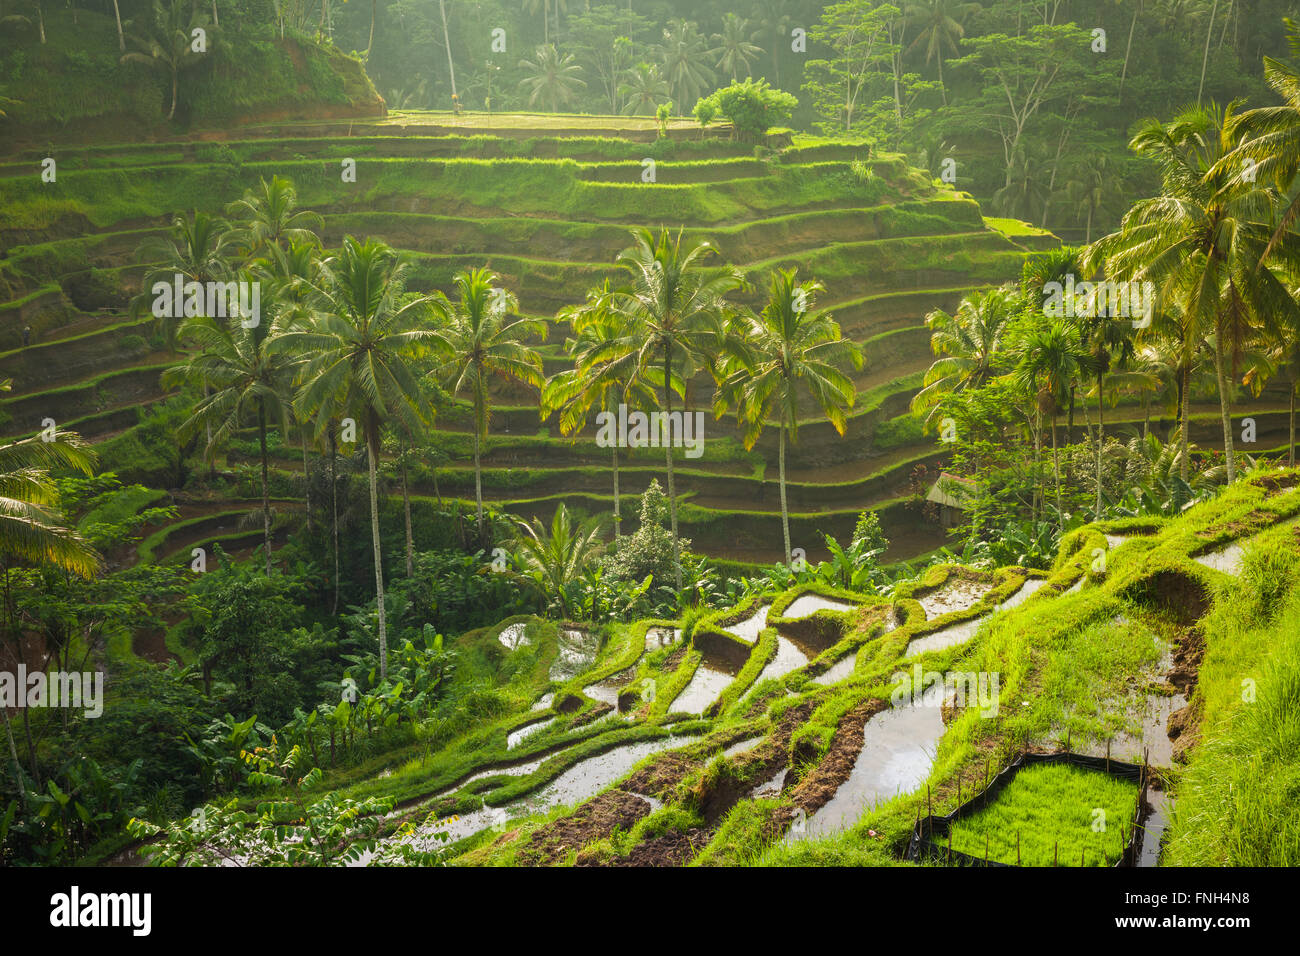 Beautiful rice terraces in the moring light near Tegallalang village, Ubud, Bali, Indonesia. Stock Photo